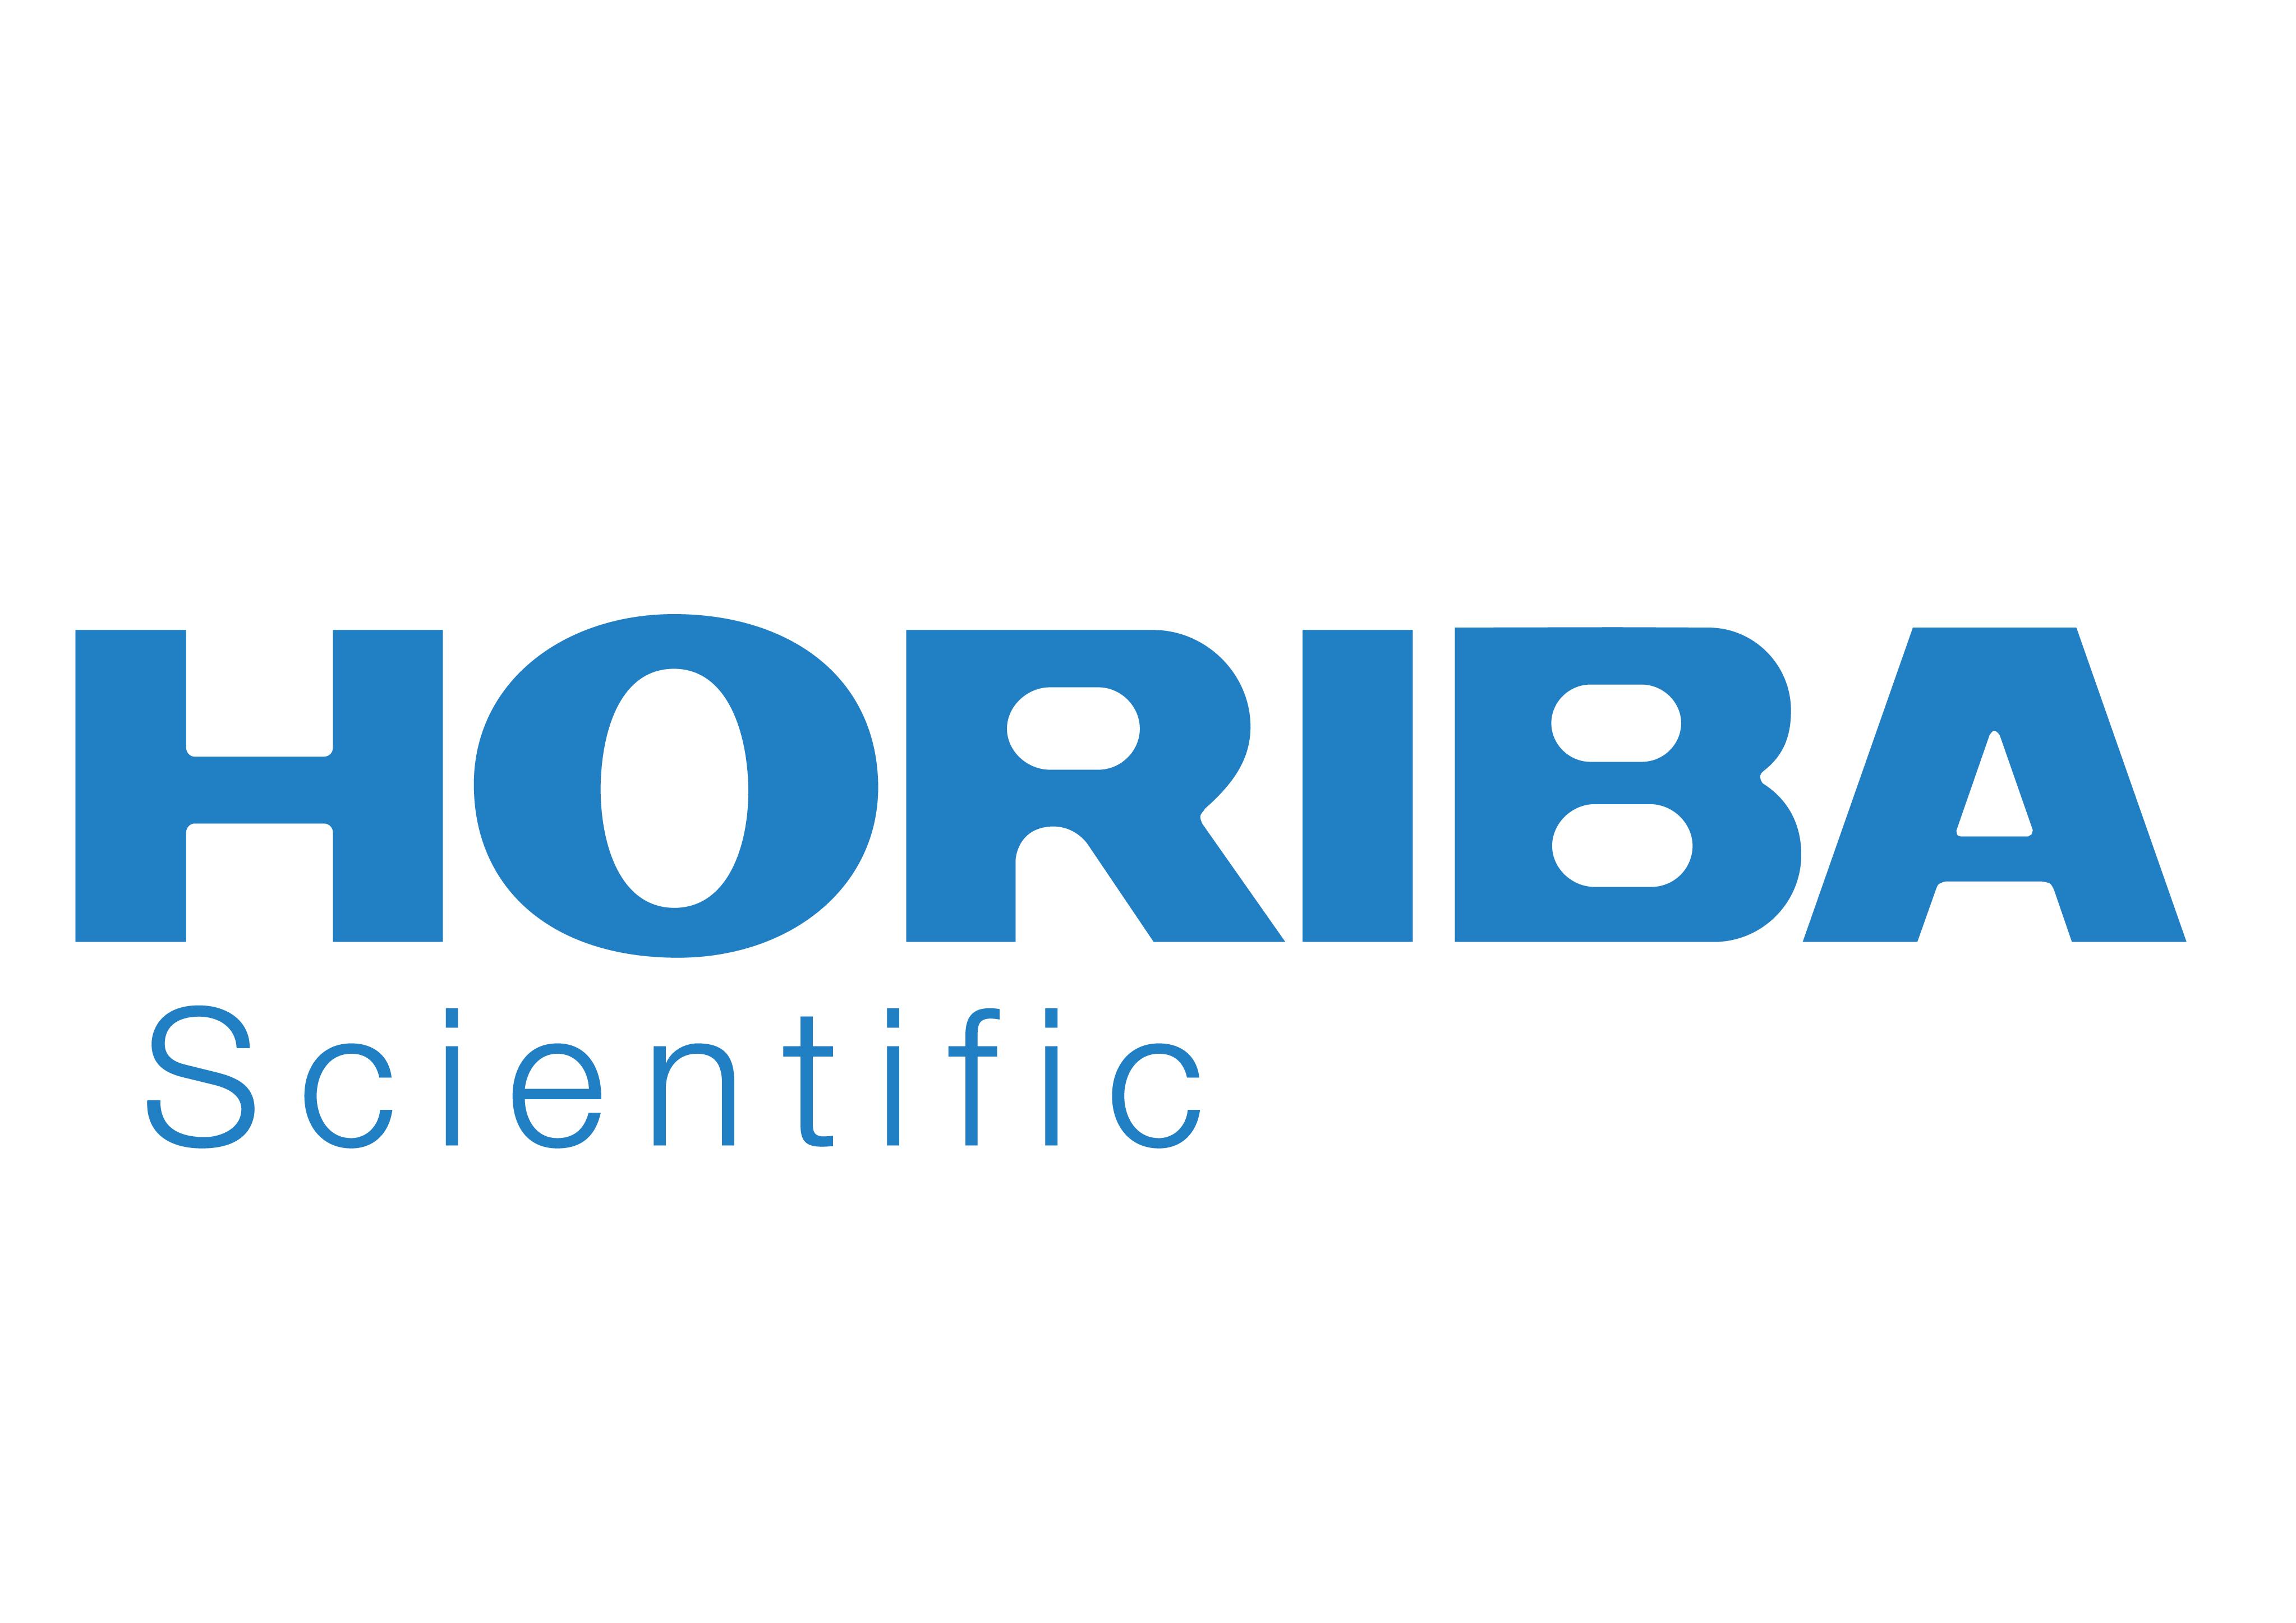 HORIBA集团科学仪器事业部